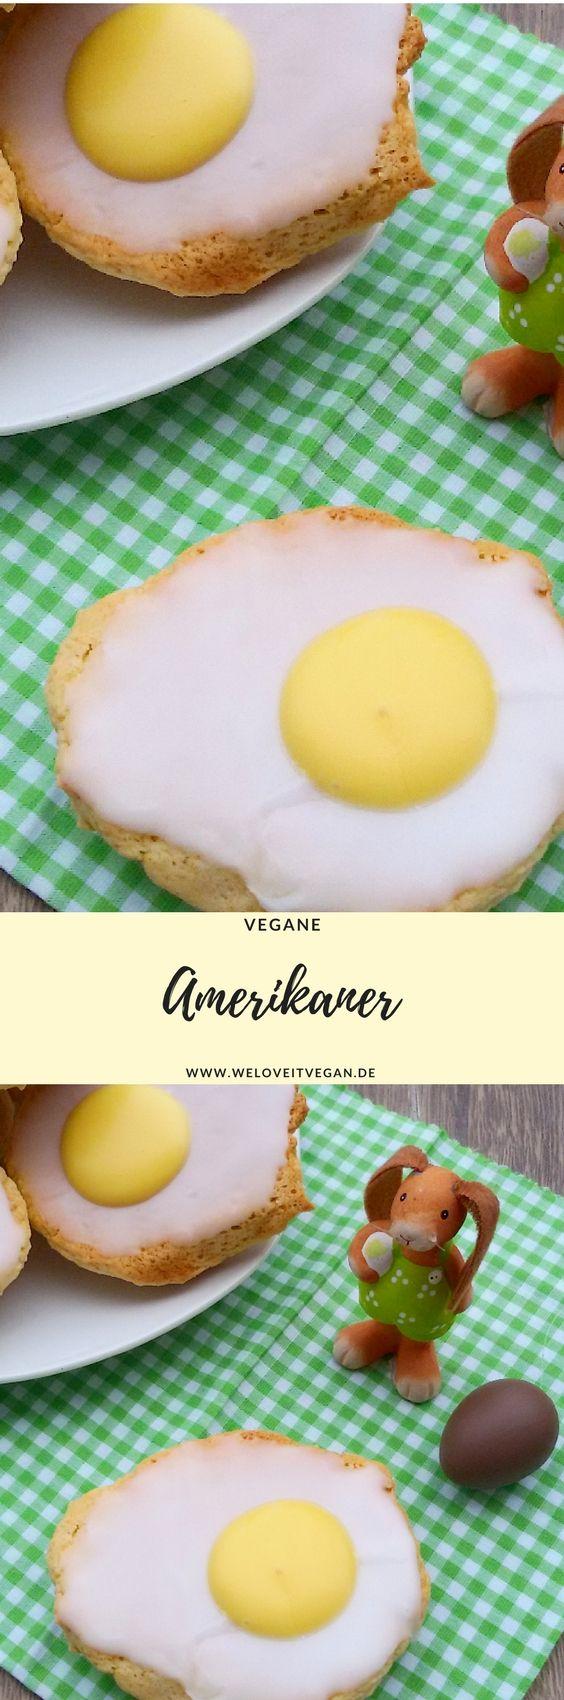 Lust auf vegane Amerikaner?